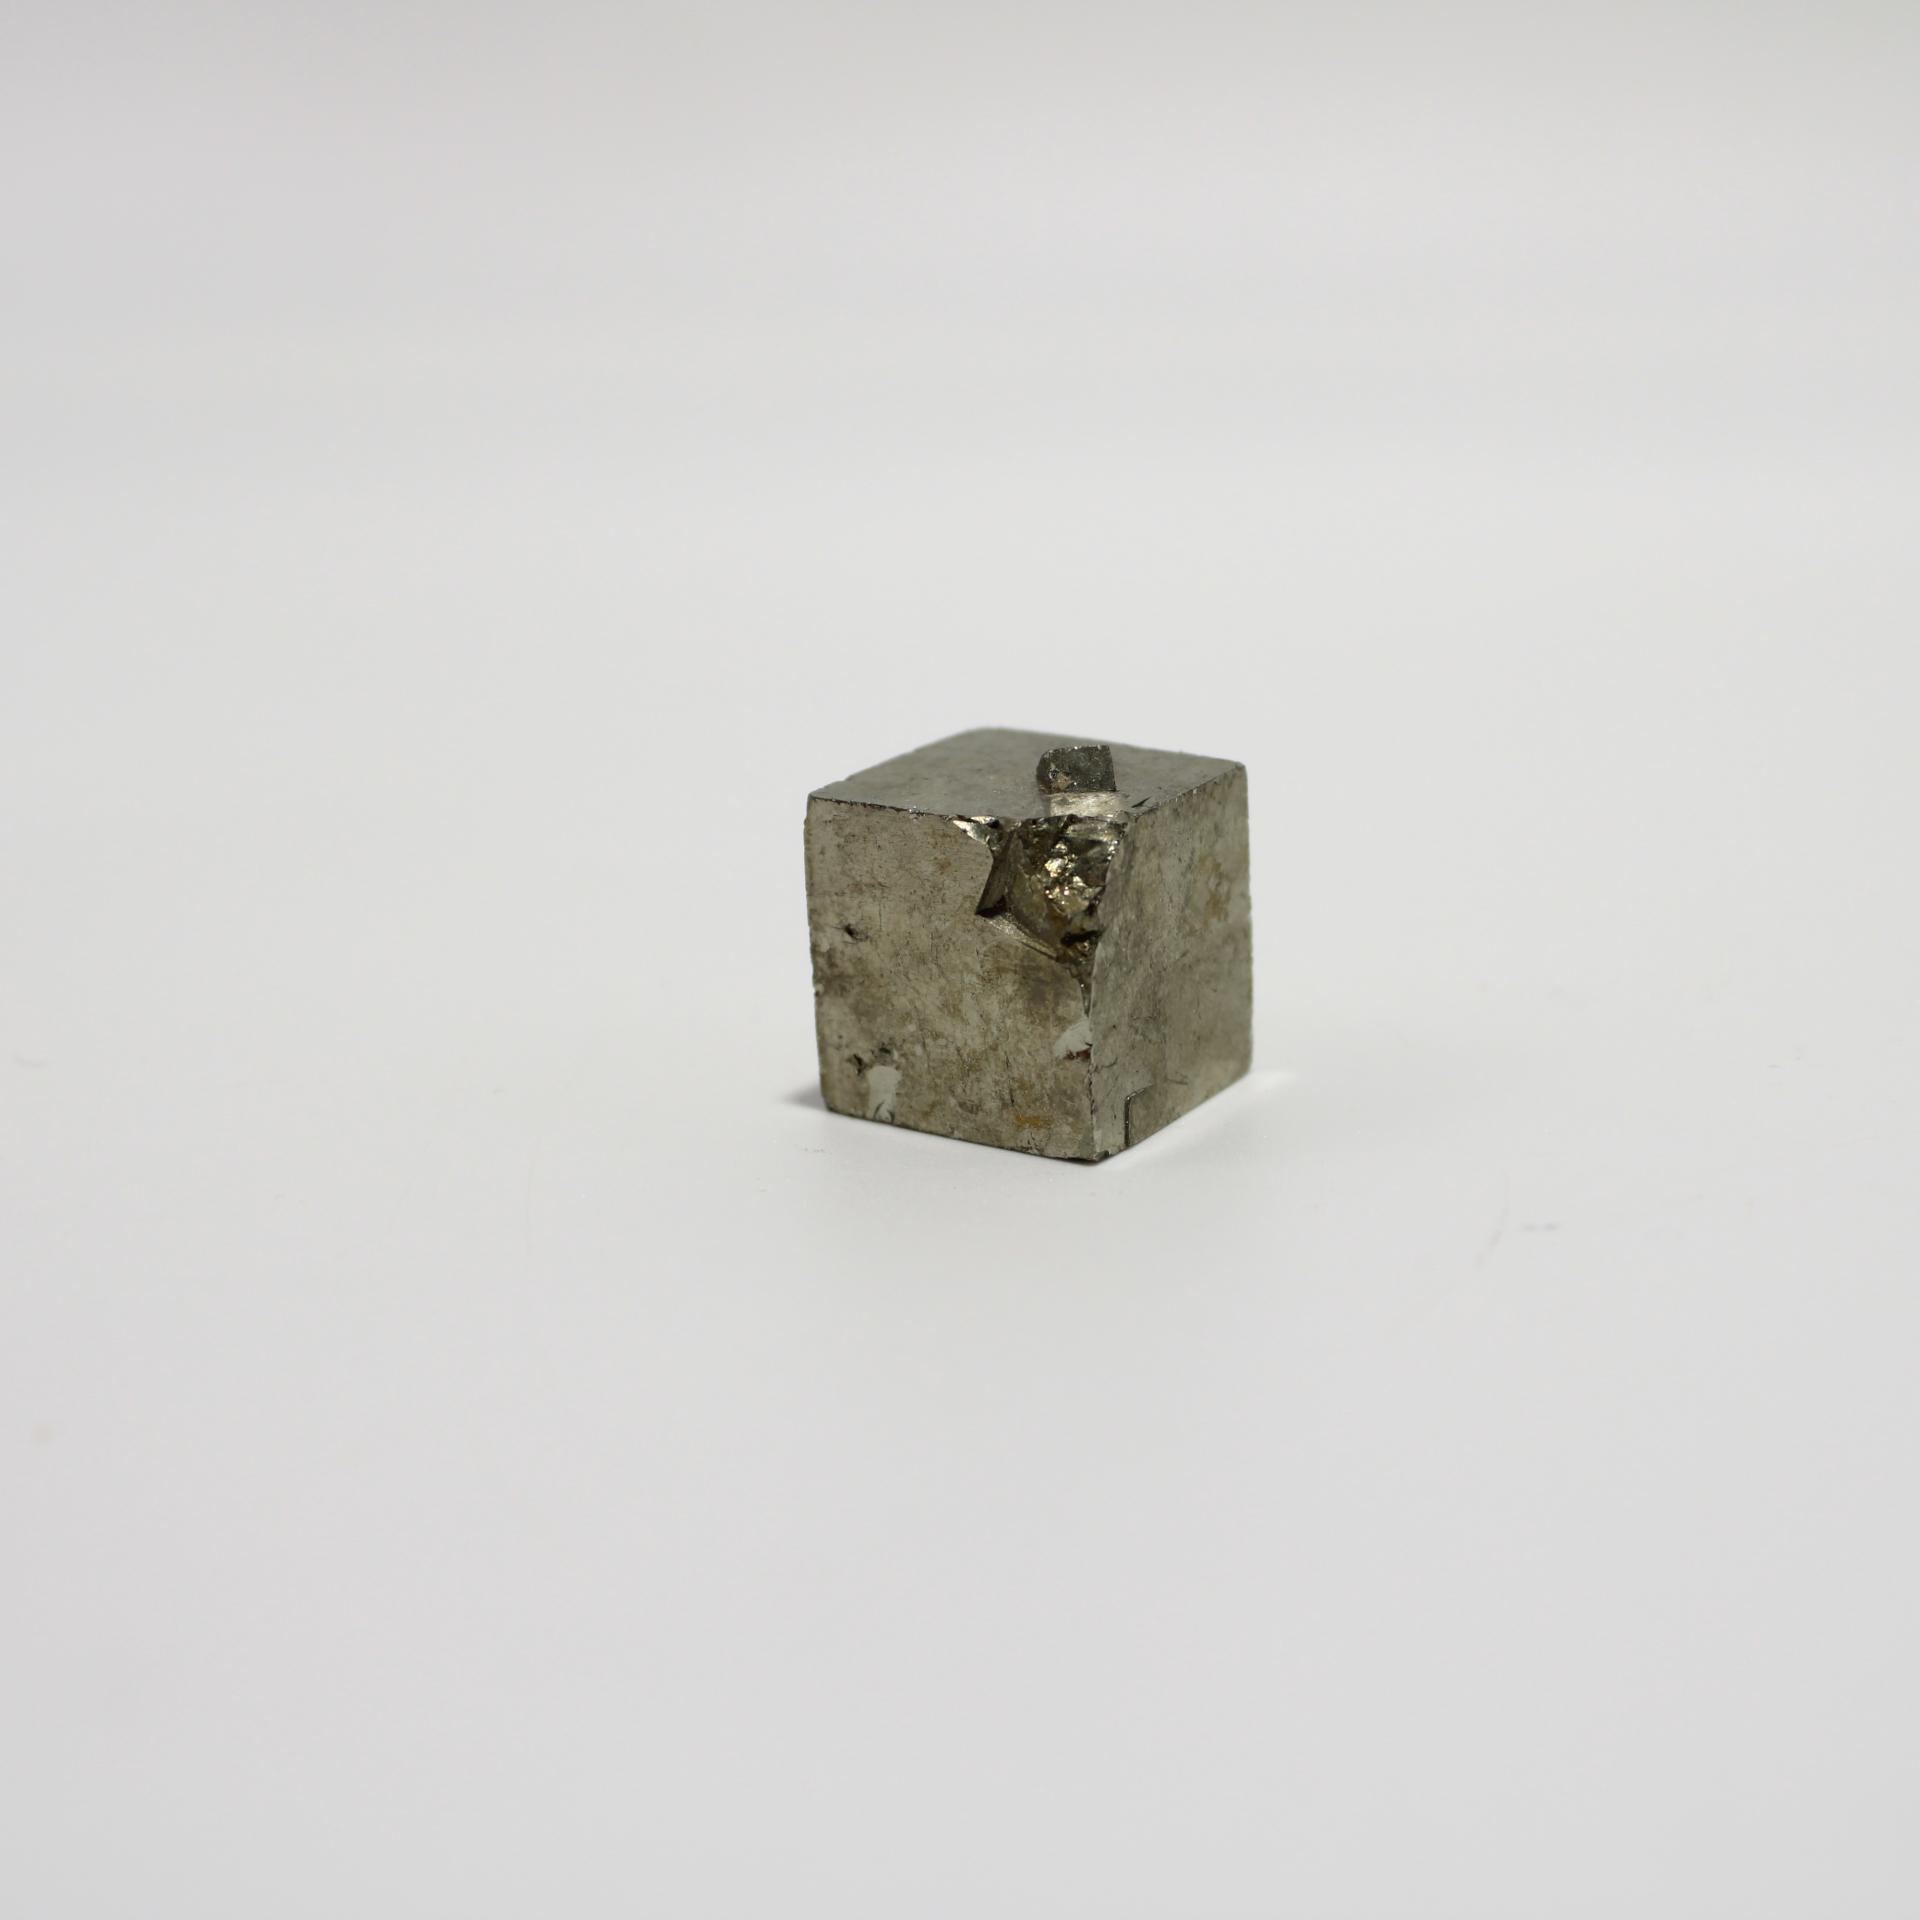 I75 pyritecube 5